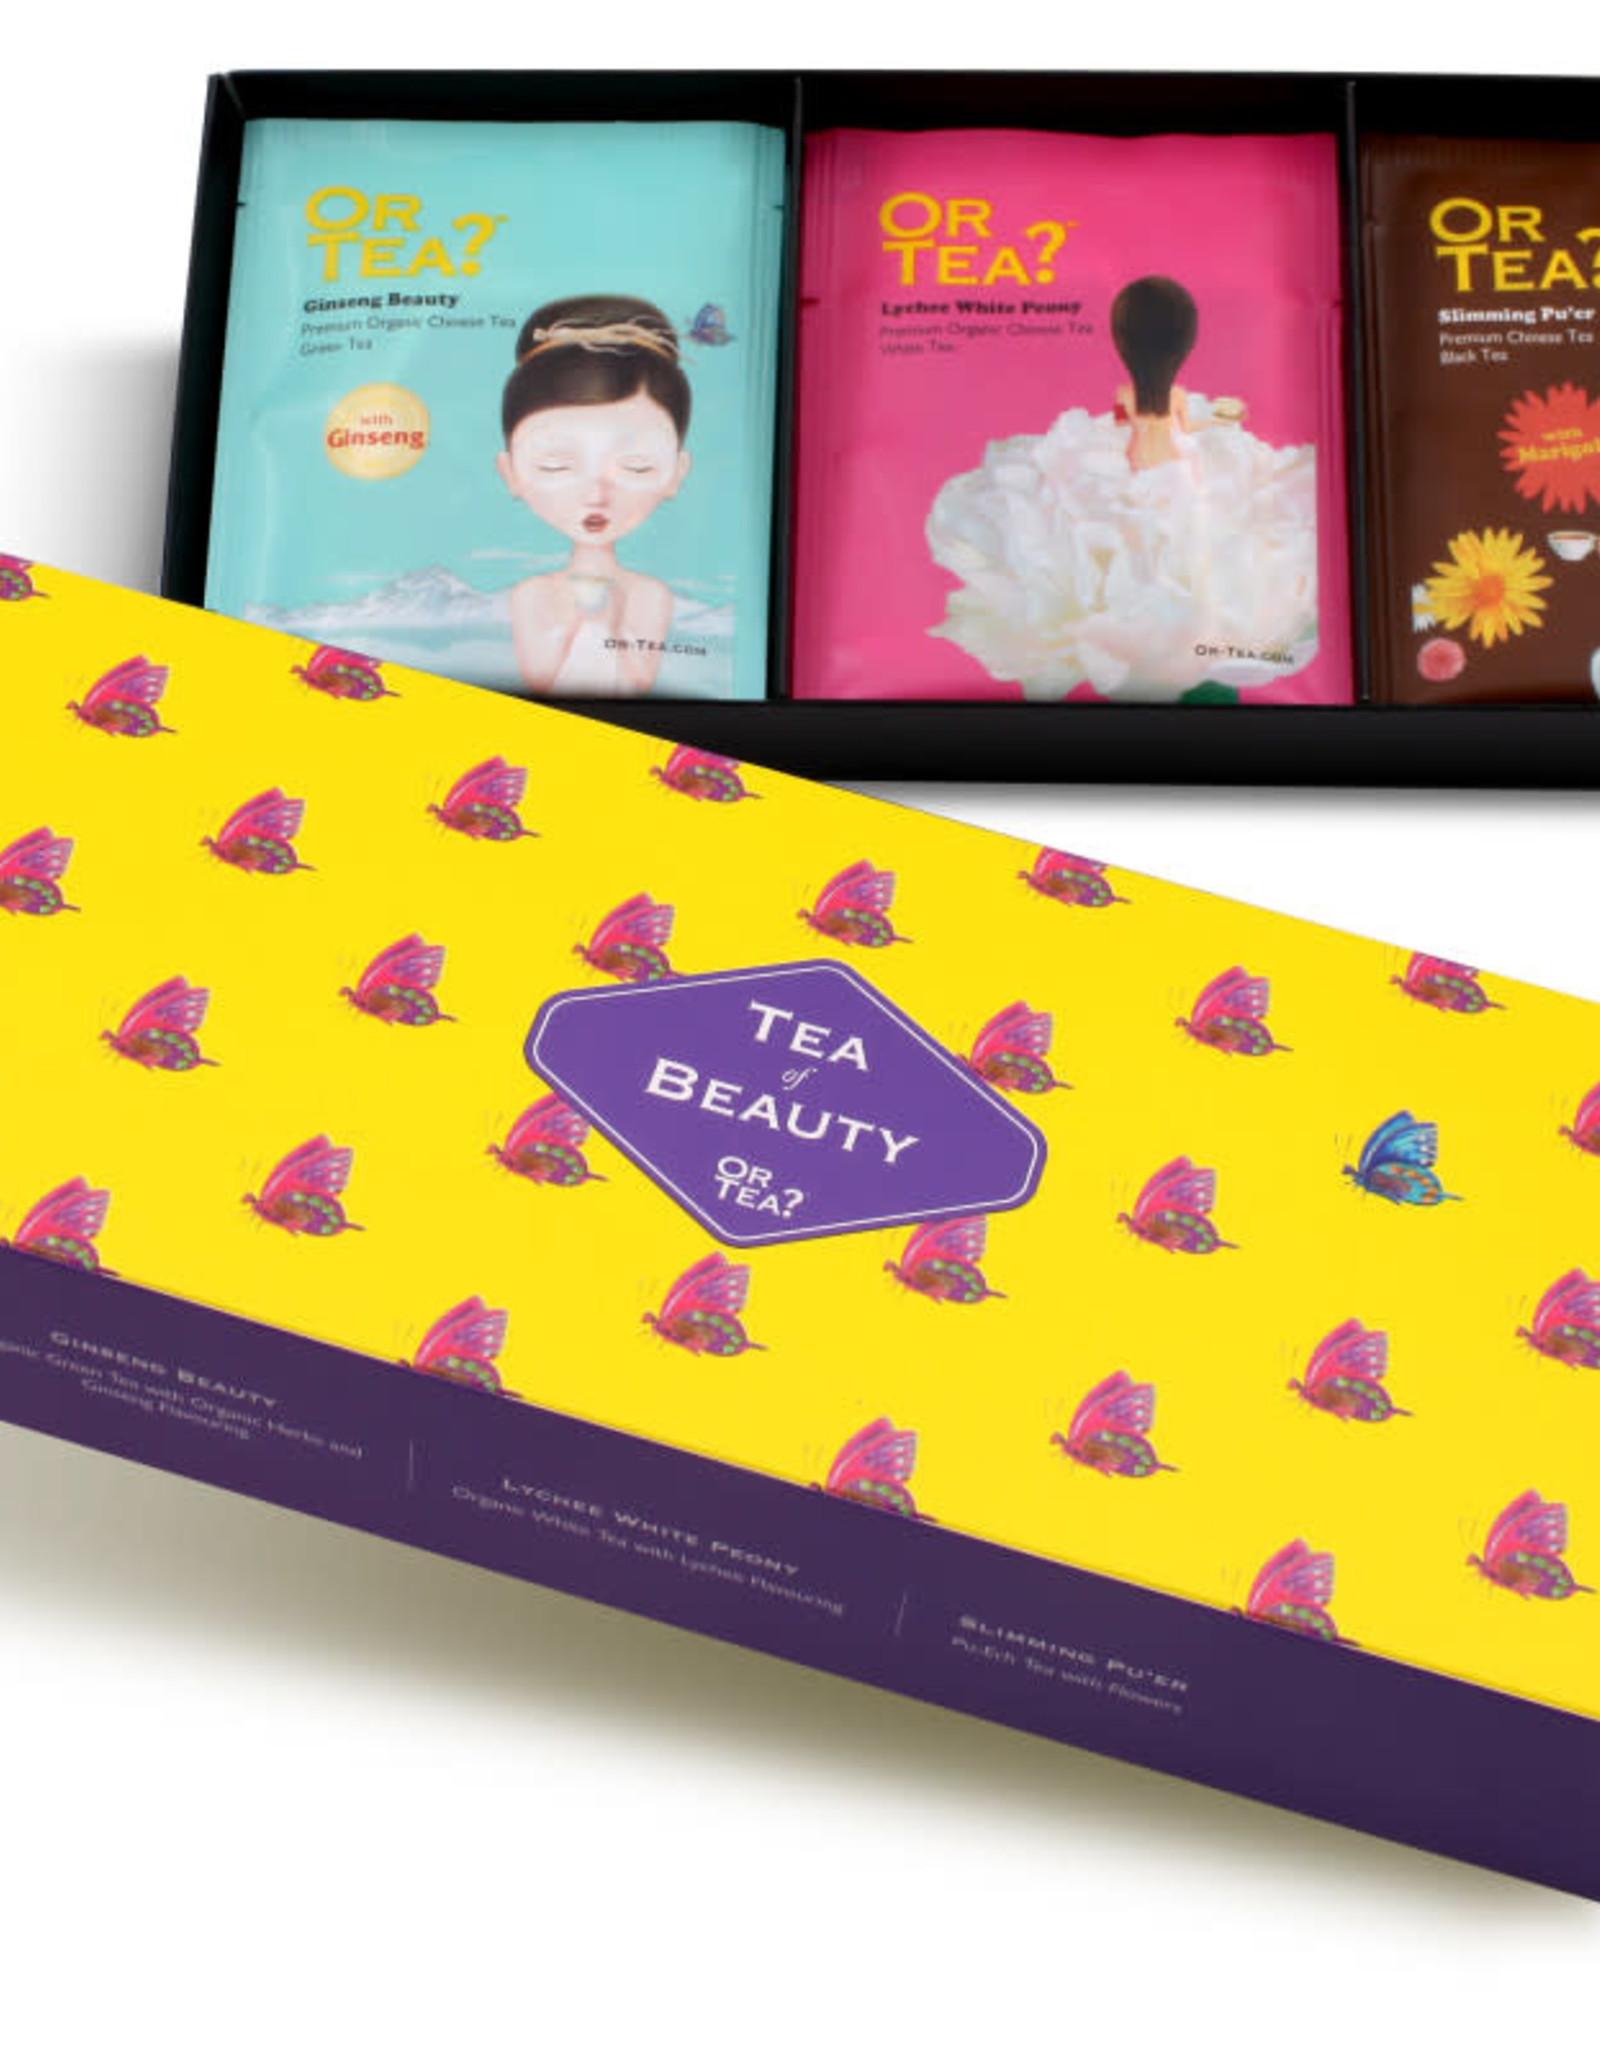 Or tea? or tea? 3-in-1 sachet combo - Tea of Beauty